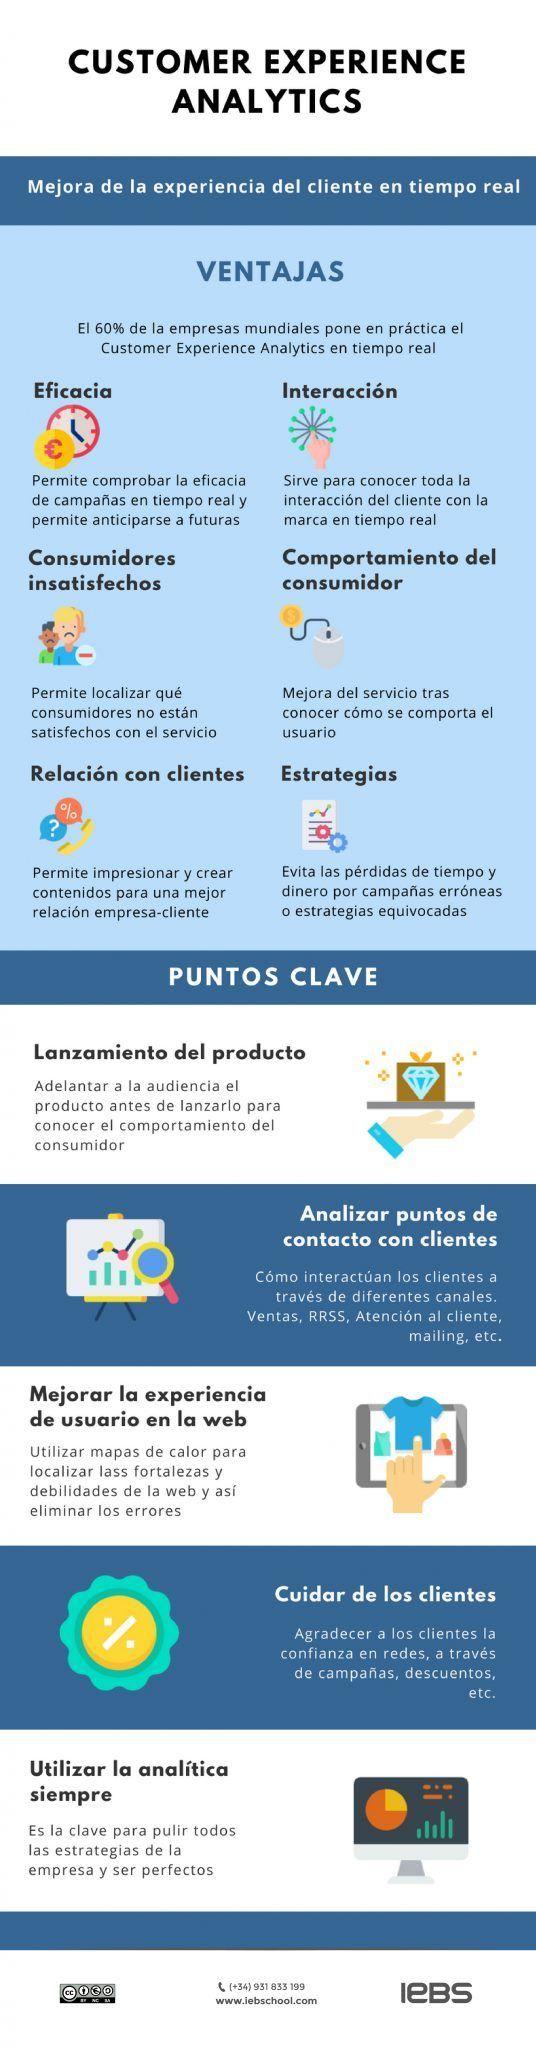 infografía customer experience analítics